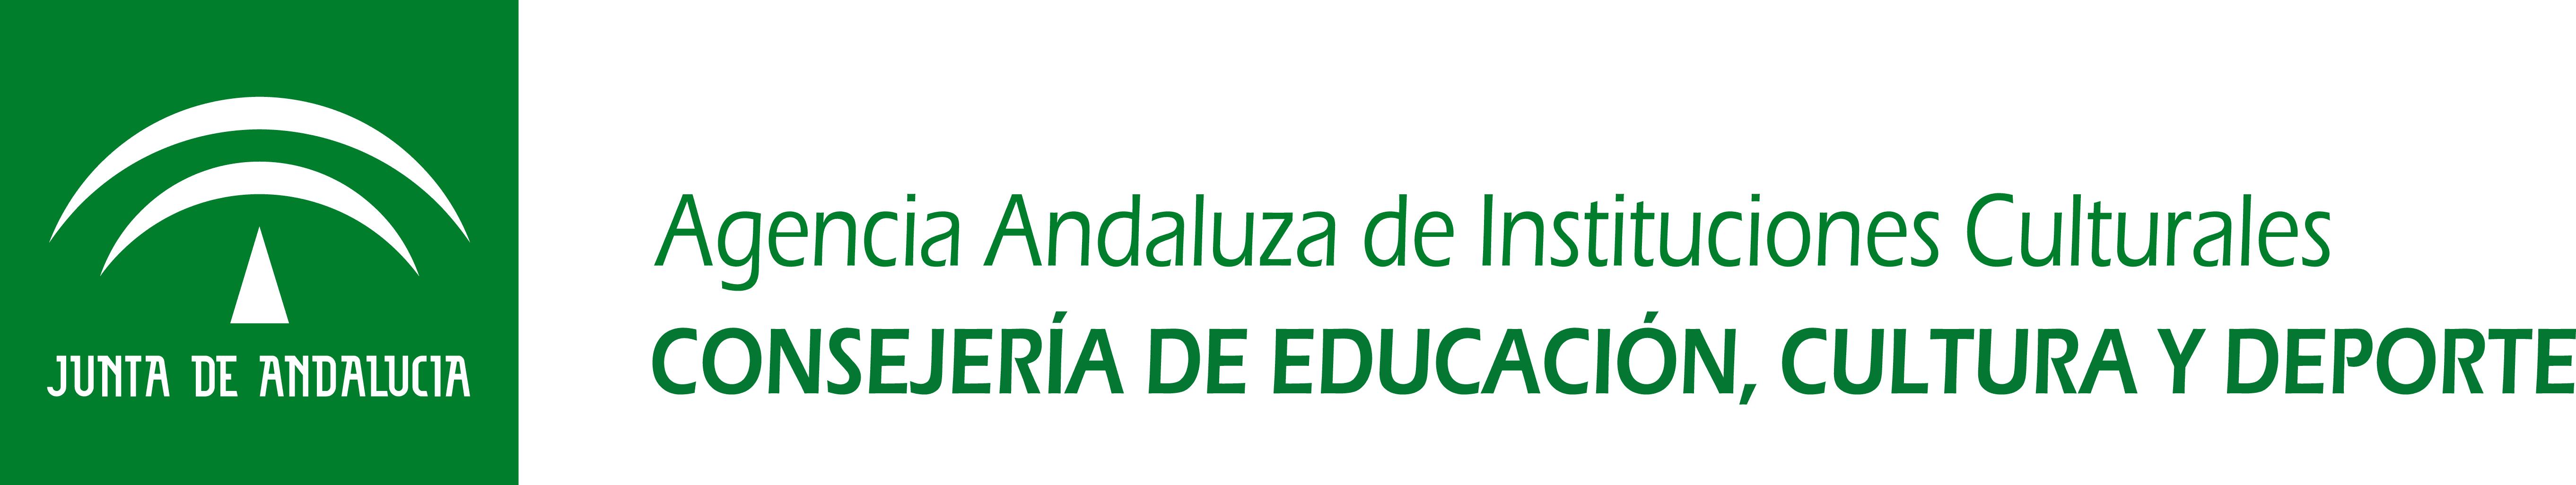 LOGO. Agencia Andaluza de Instituciones Culturales